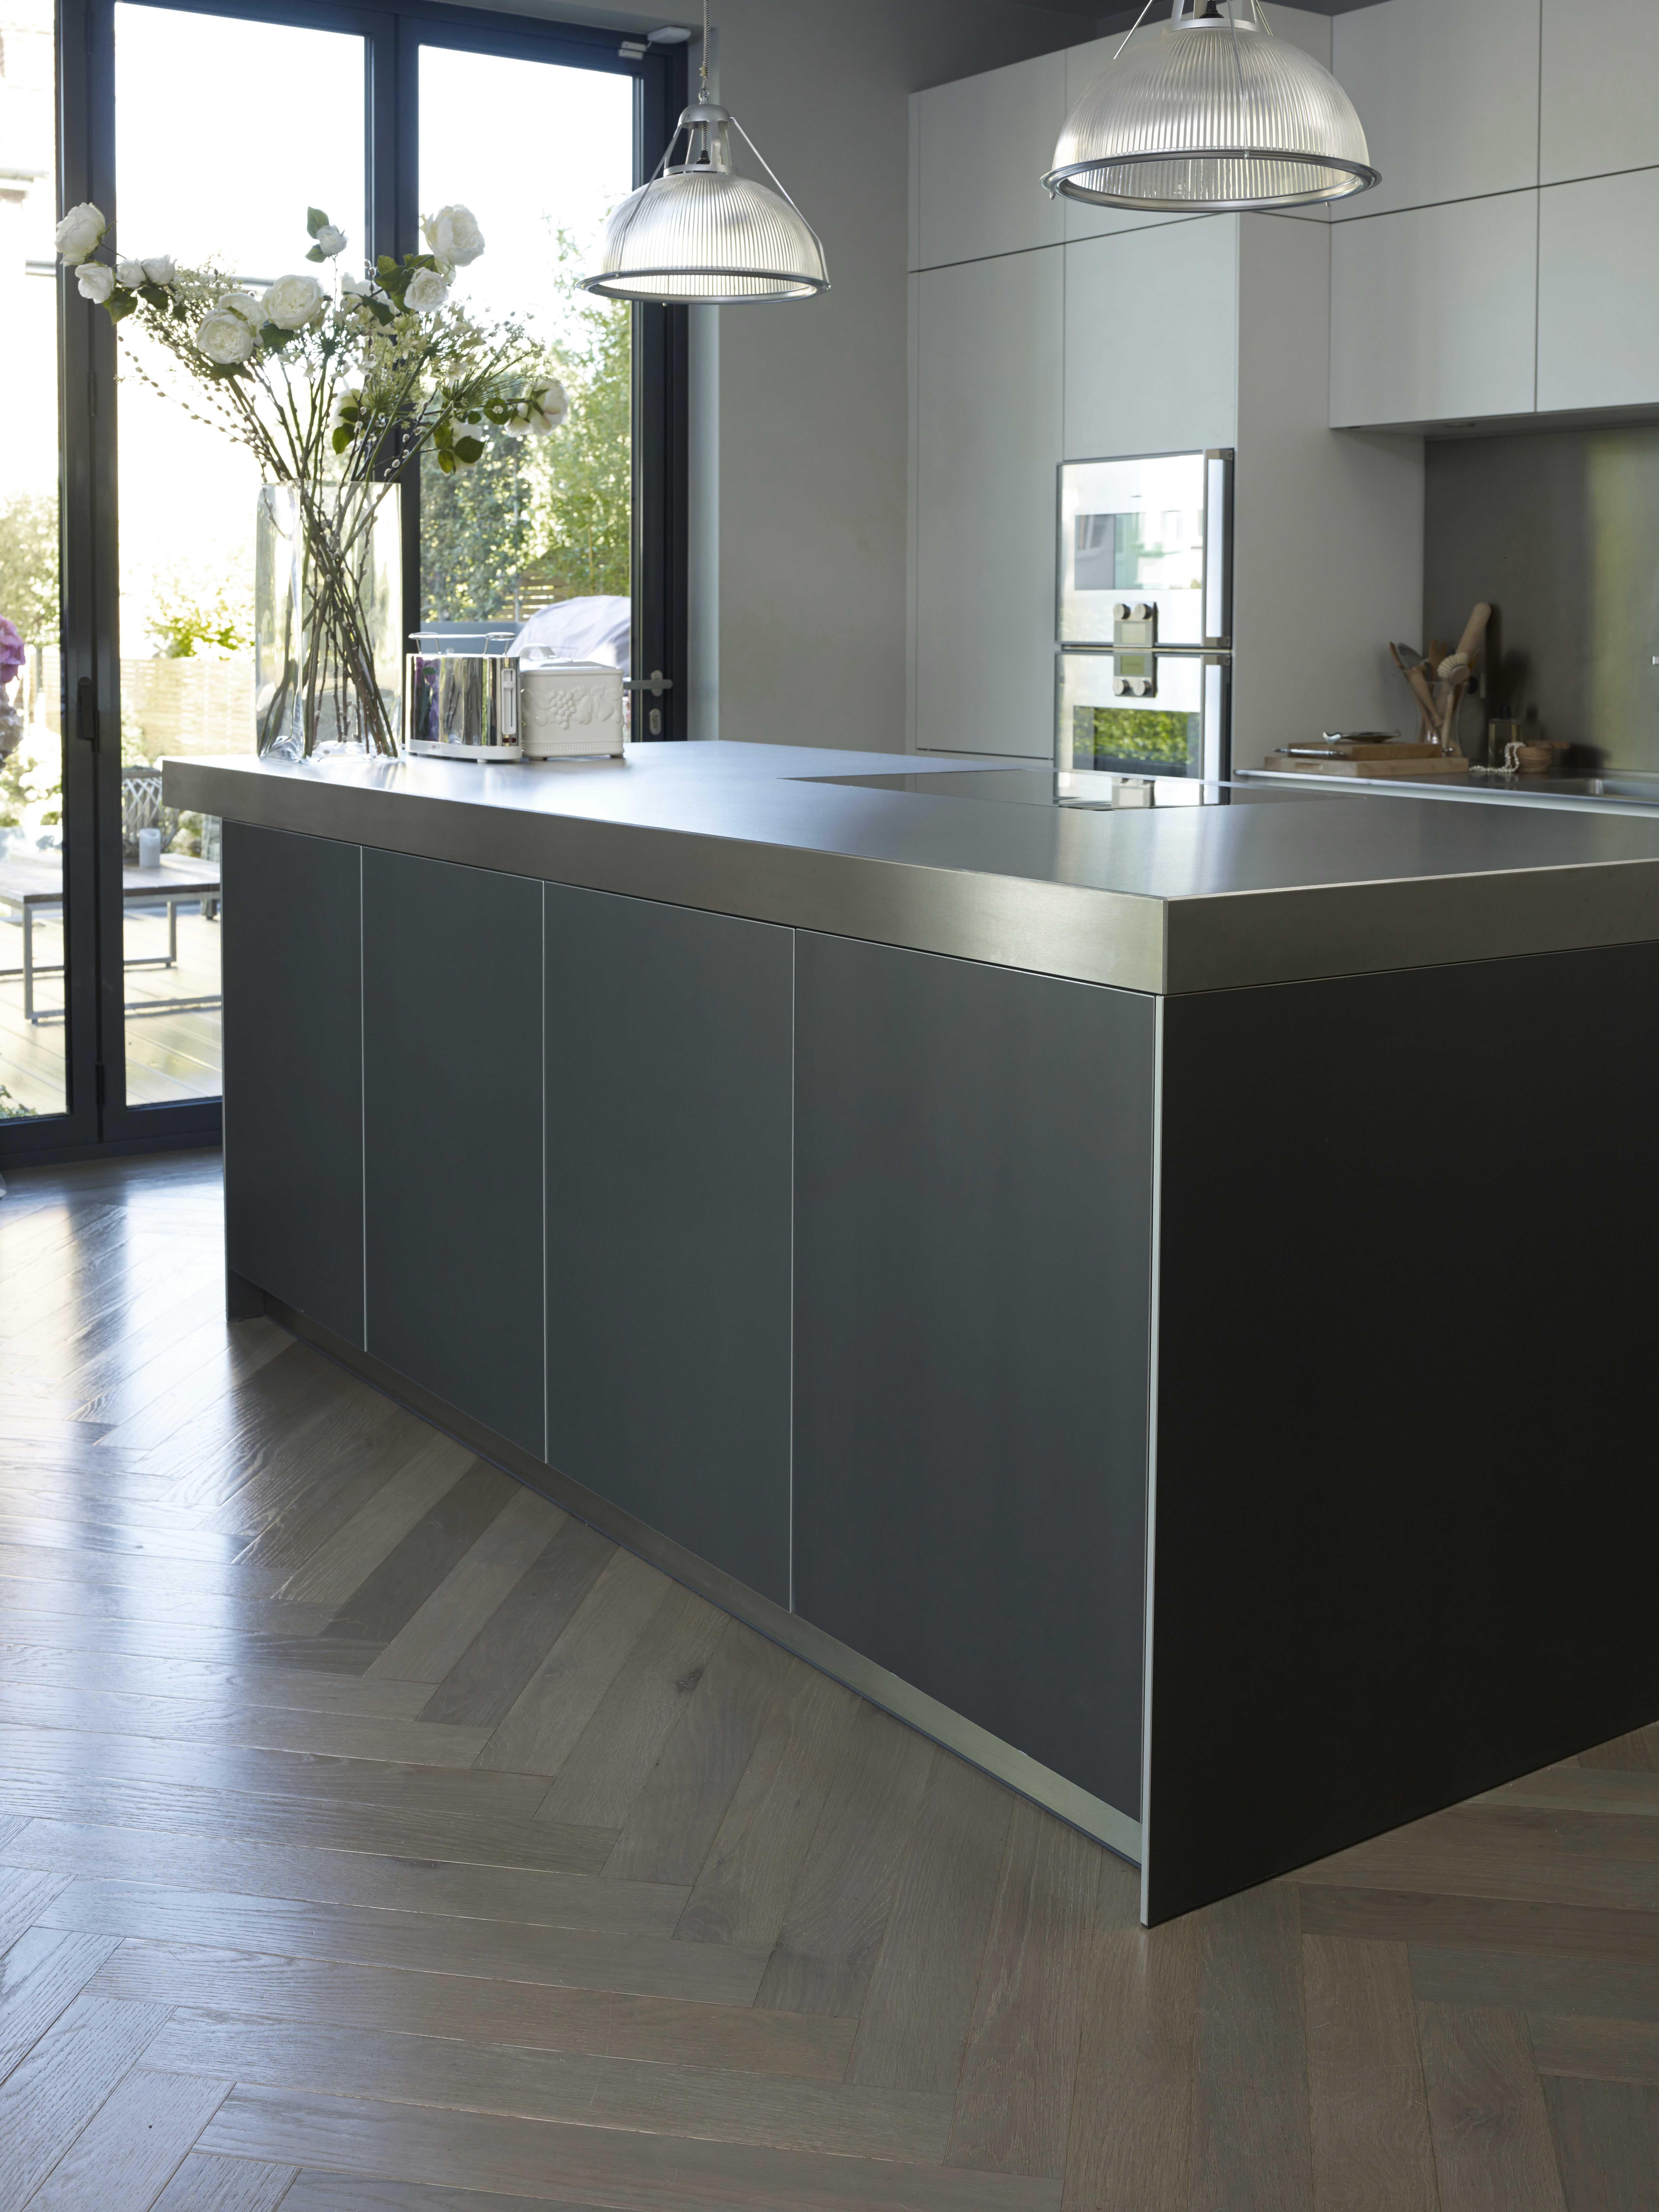 Putney Trunk Floor Flooring, Putney, Kitchen dining